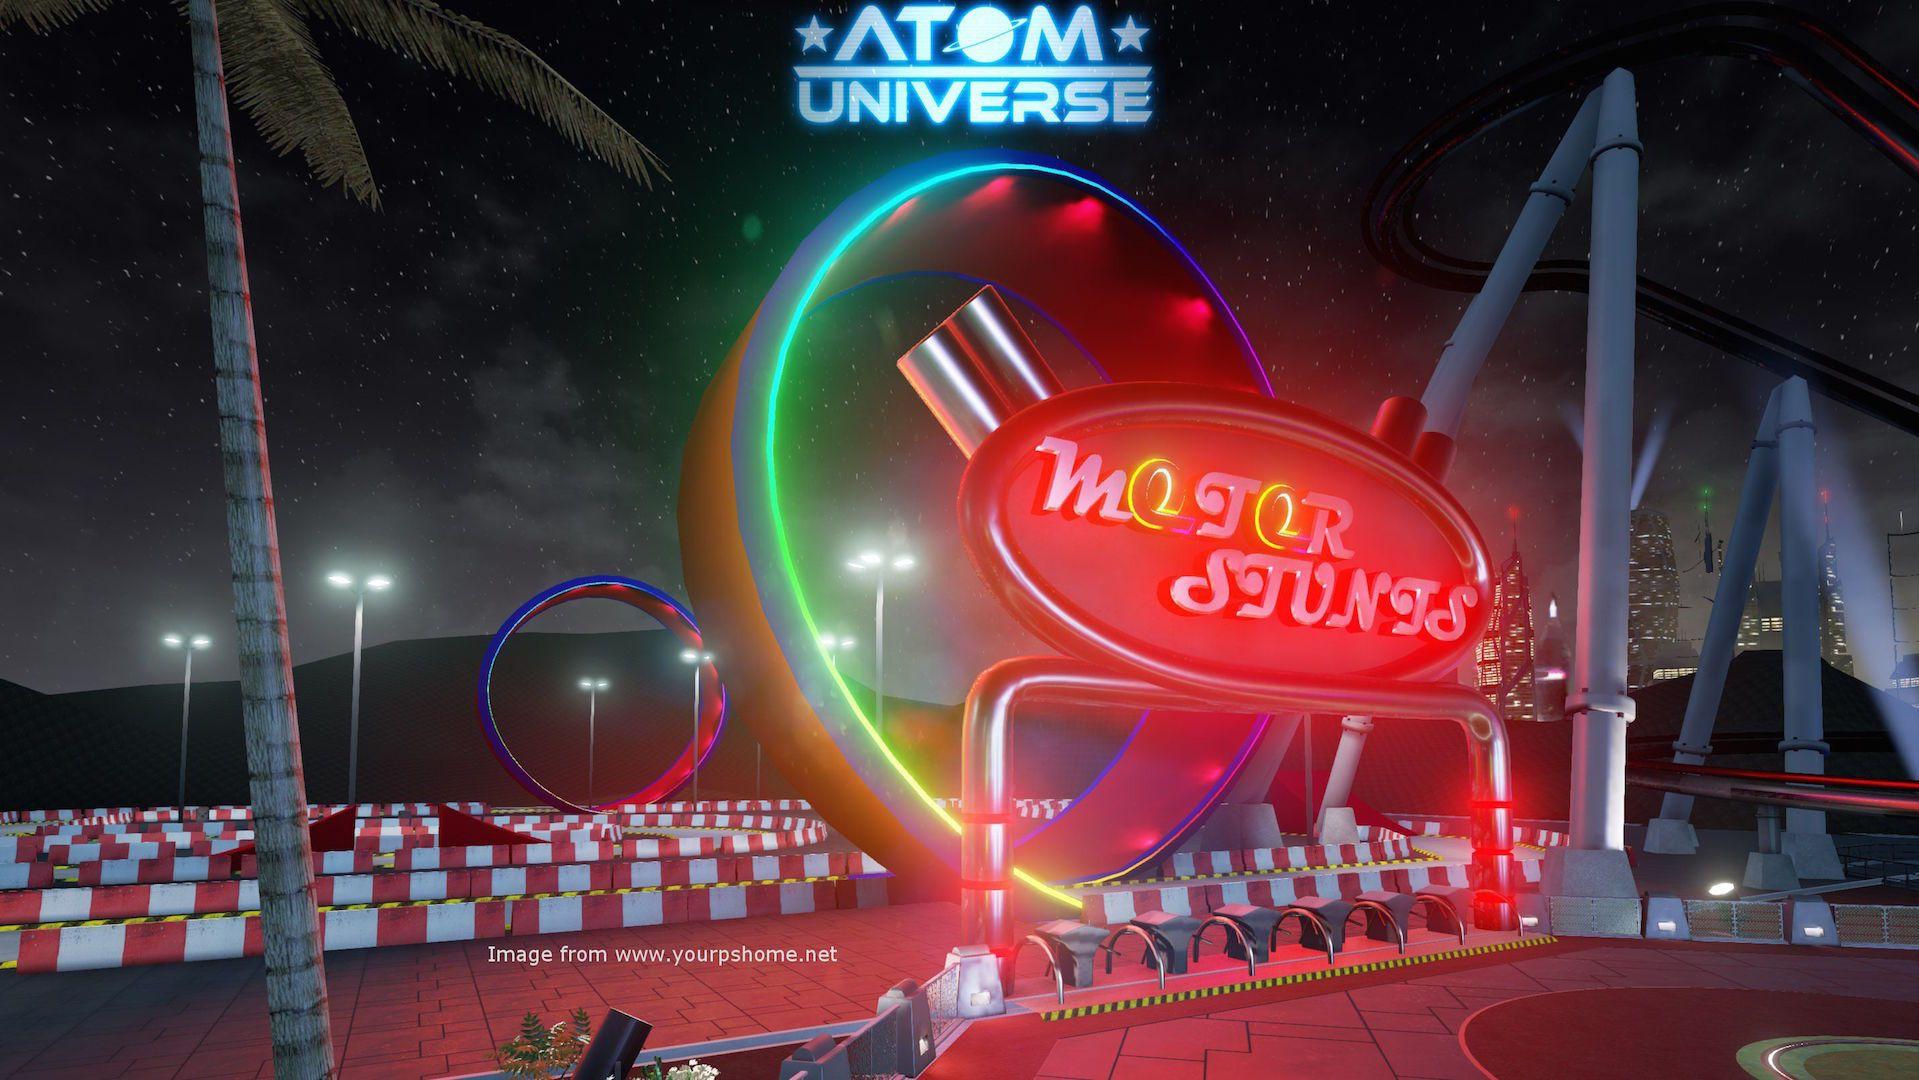 Karen Talks To Atom Republic About Atom Universe, kwoman32, Nov 30, 2014, 4:55 PM, YourPSHome.net, jpg, MotorStunts-copy.jpg